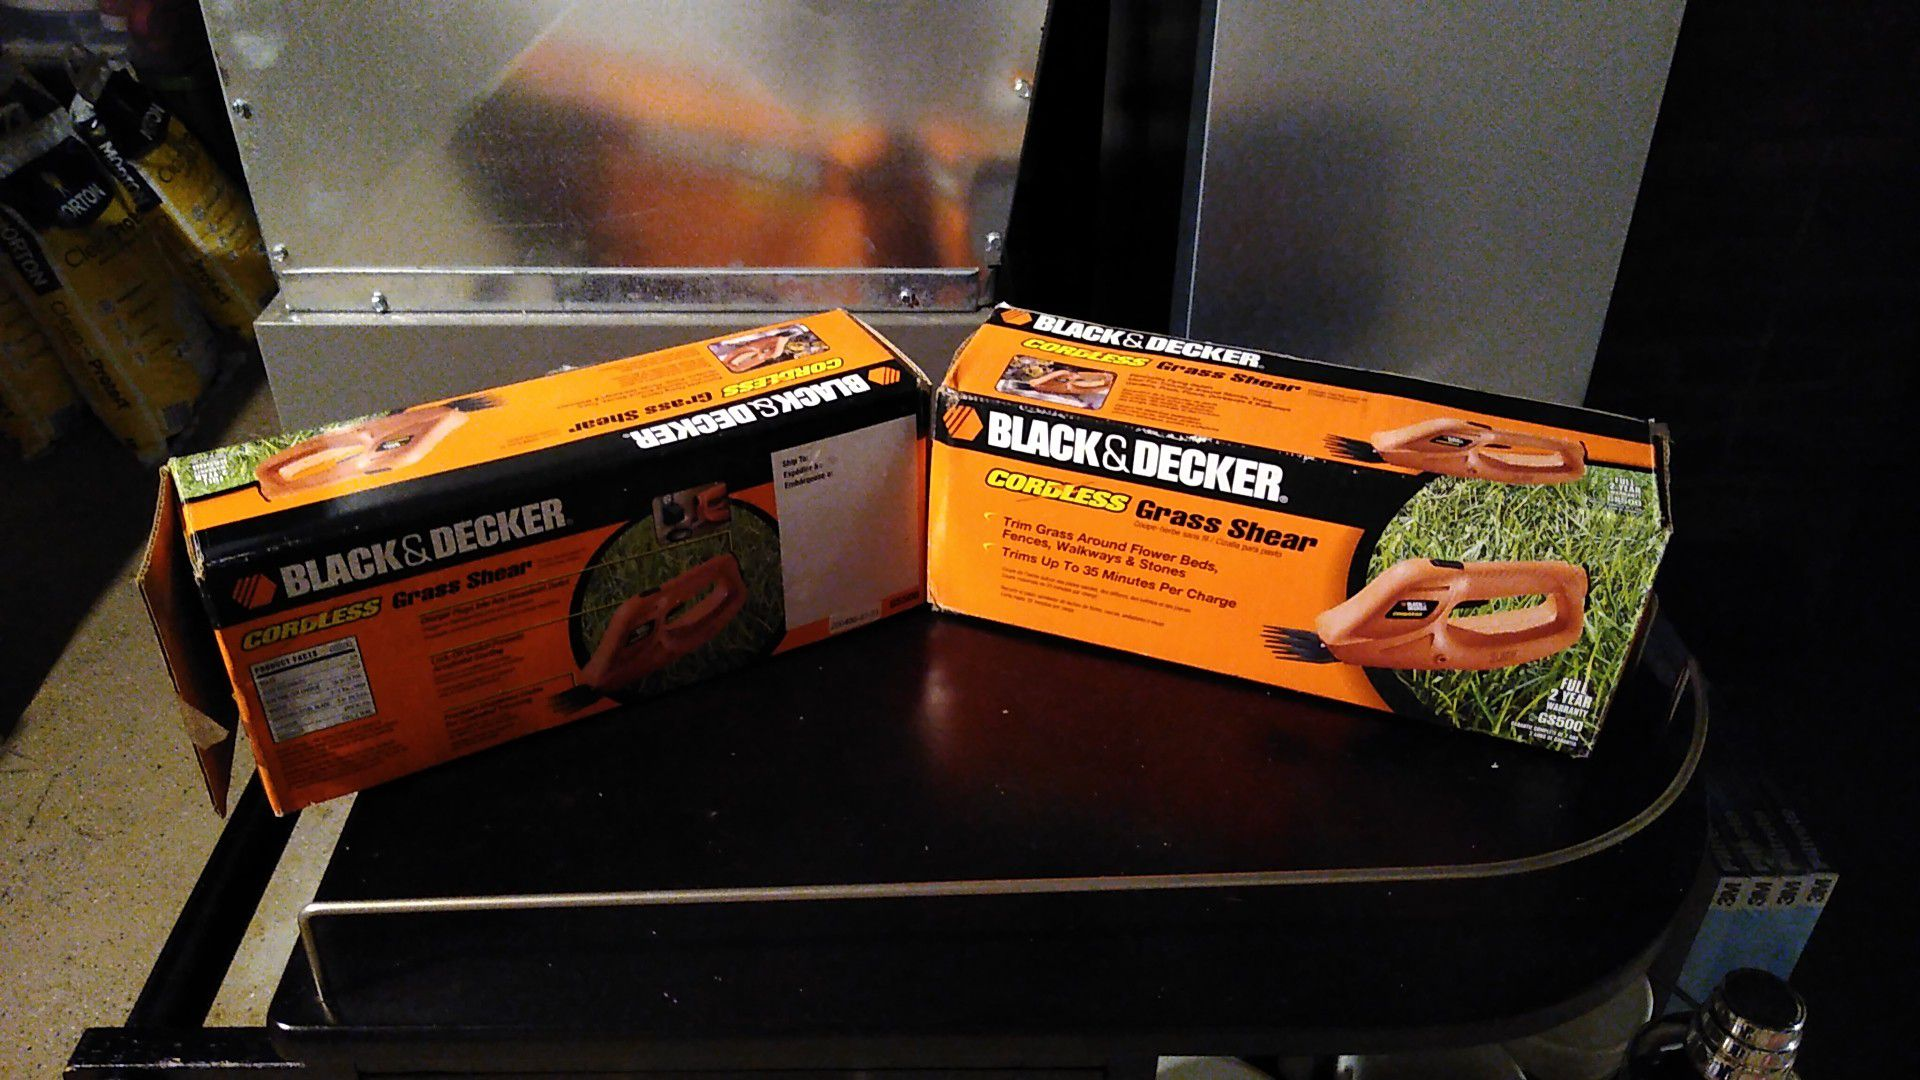 2 Black& Decker cordless Grass shears